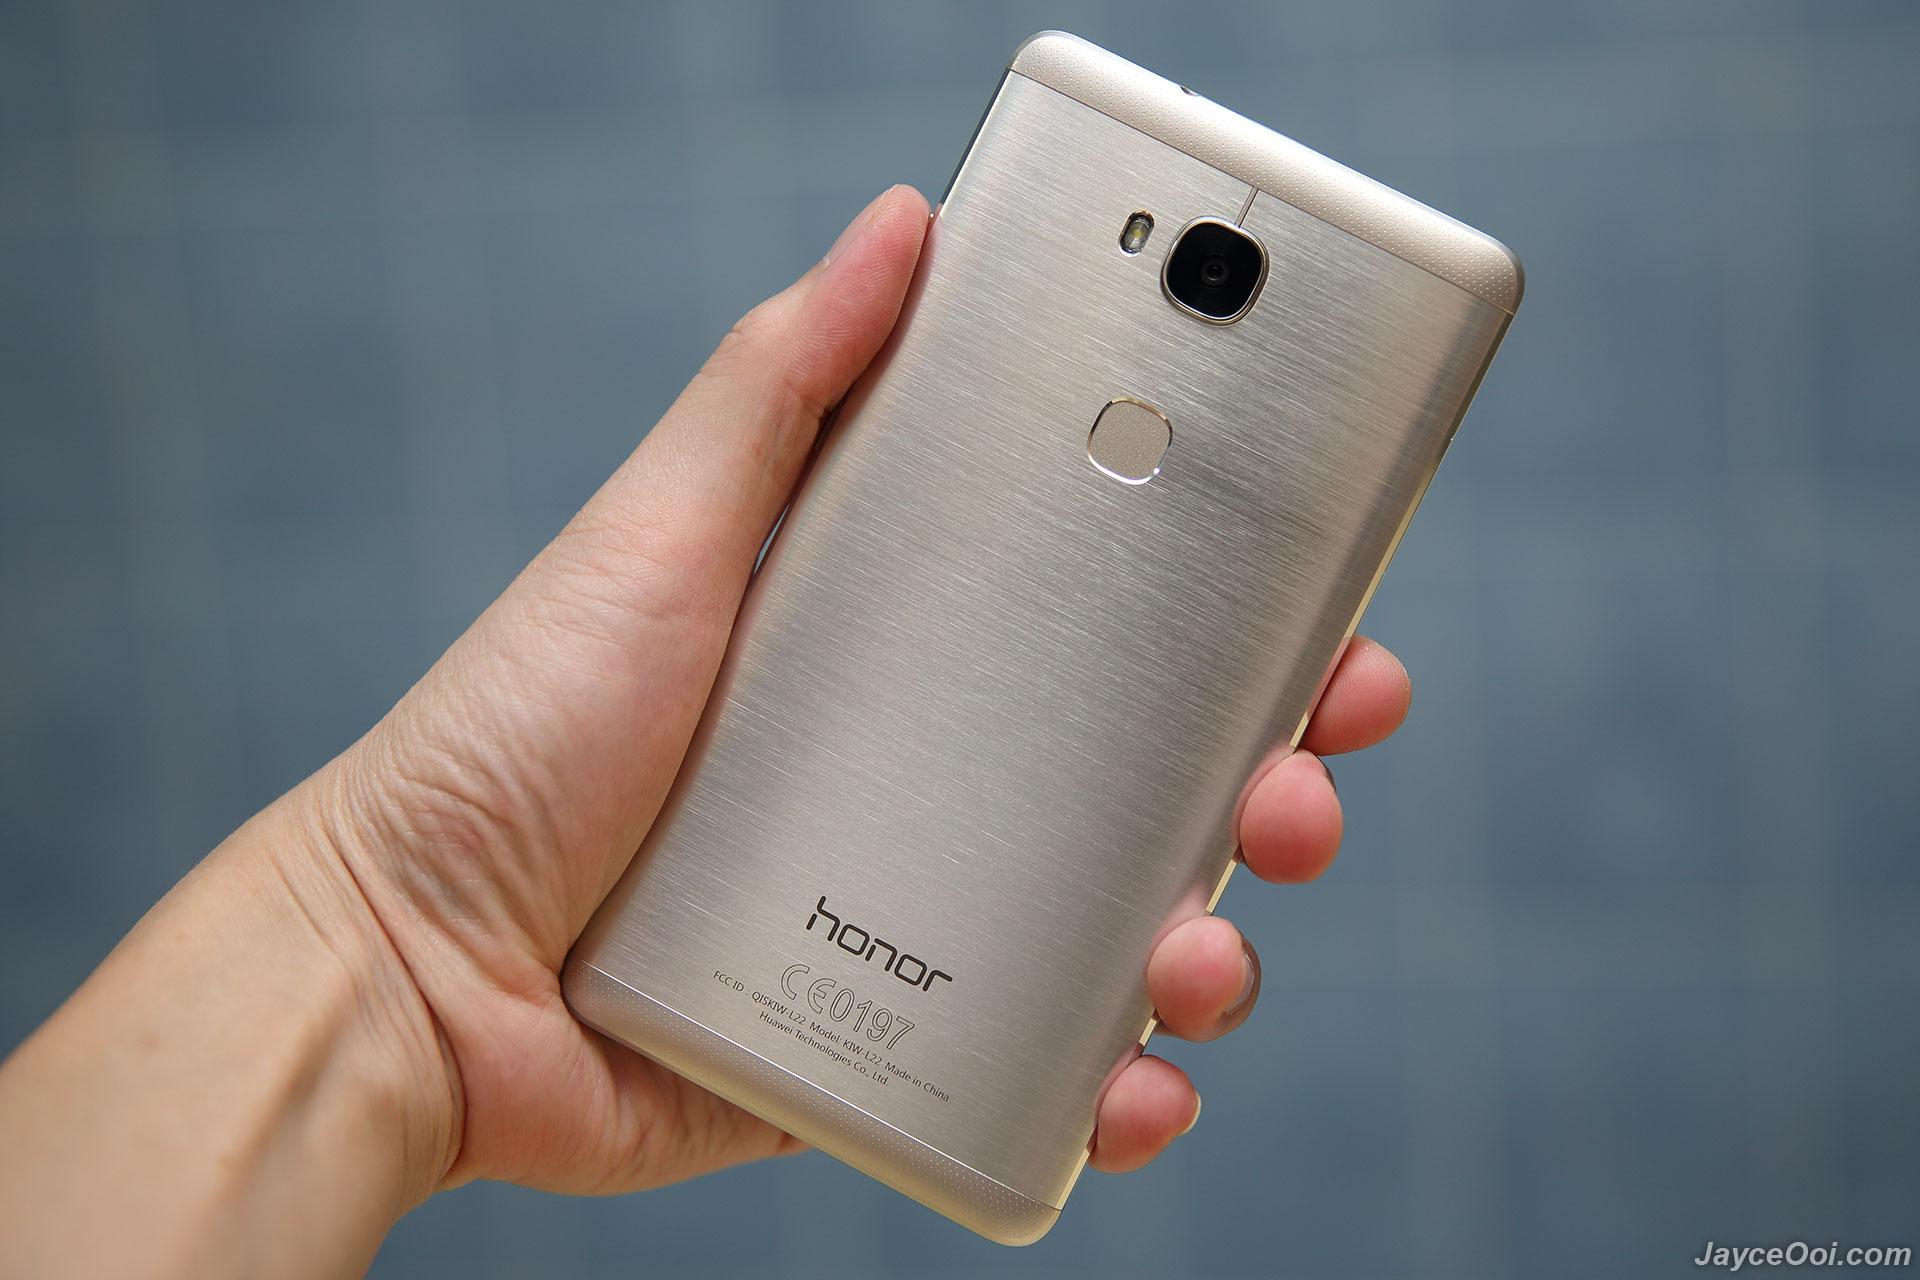 Huawei Honor 5X Review - JayceOoi com